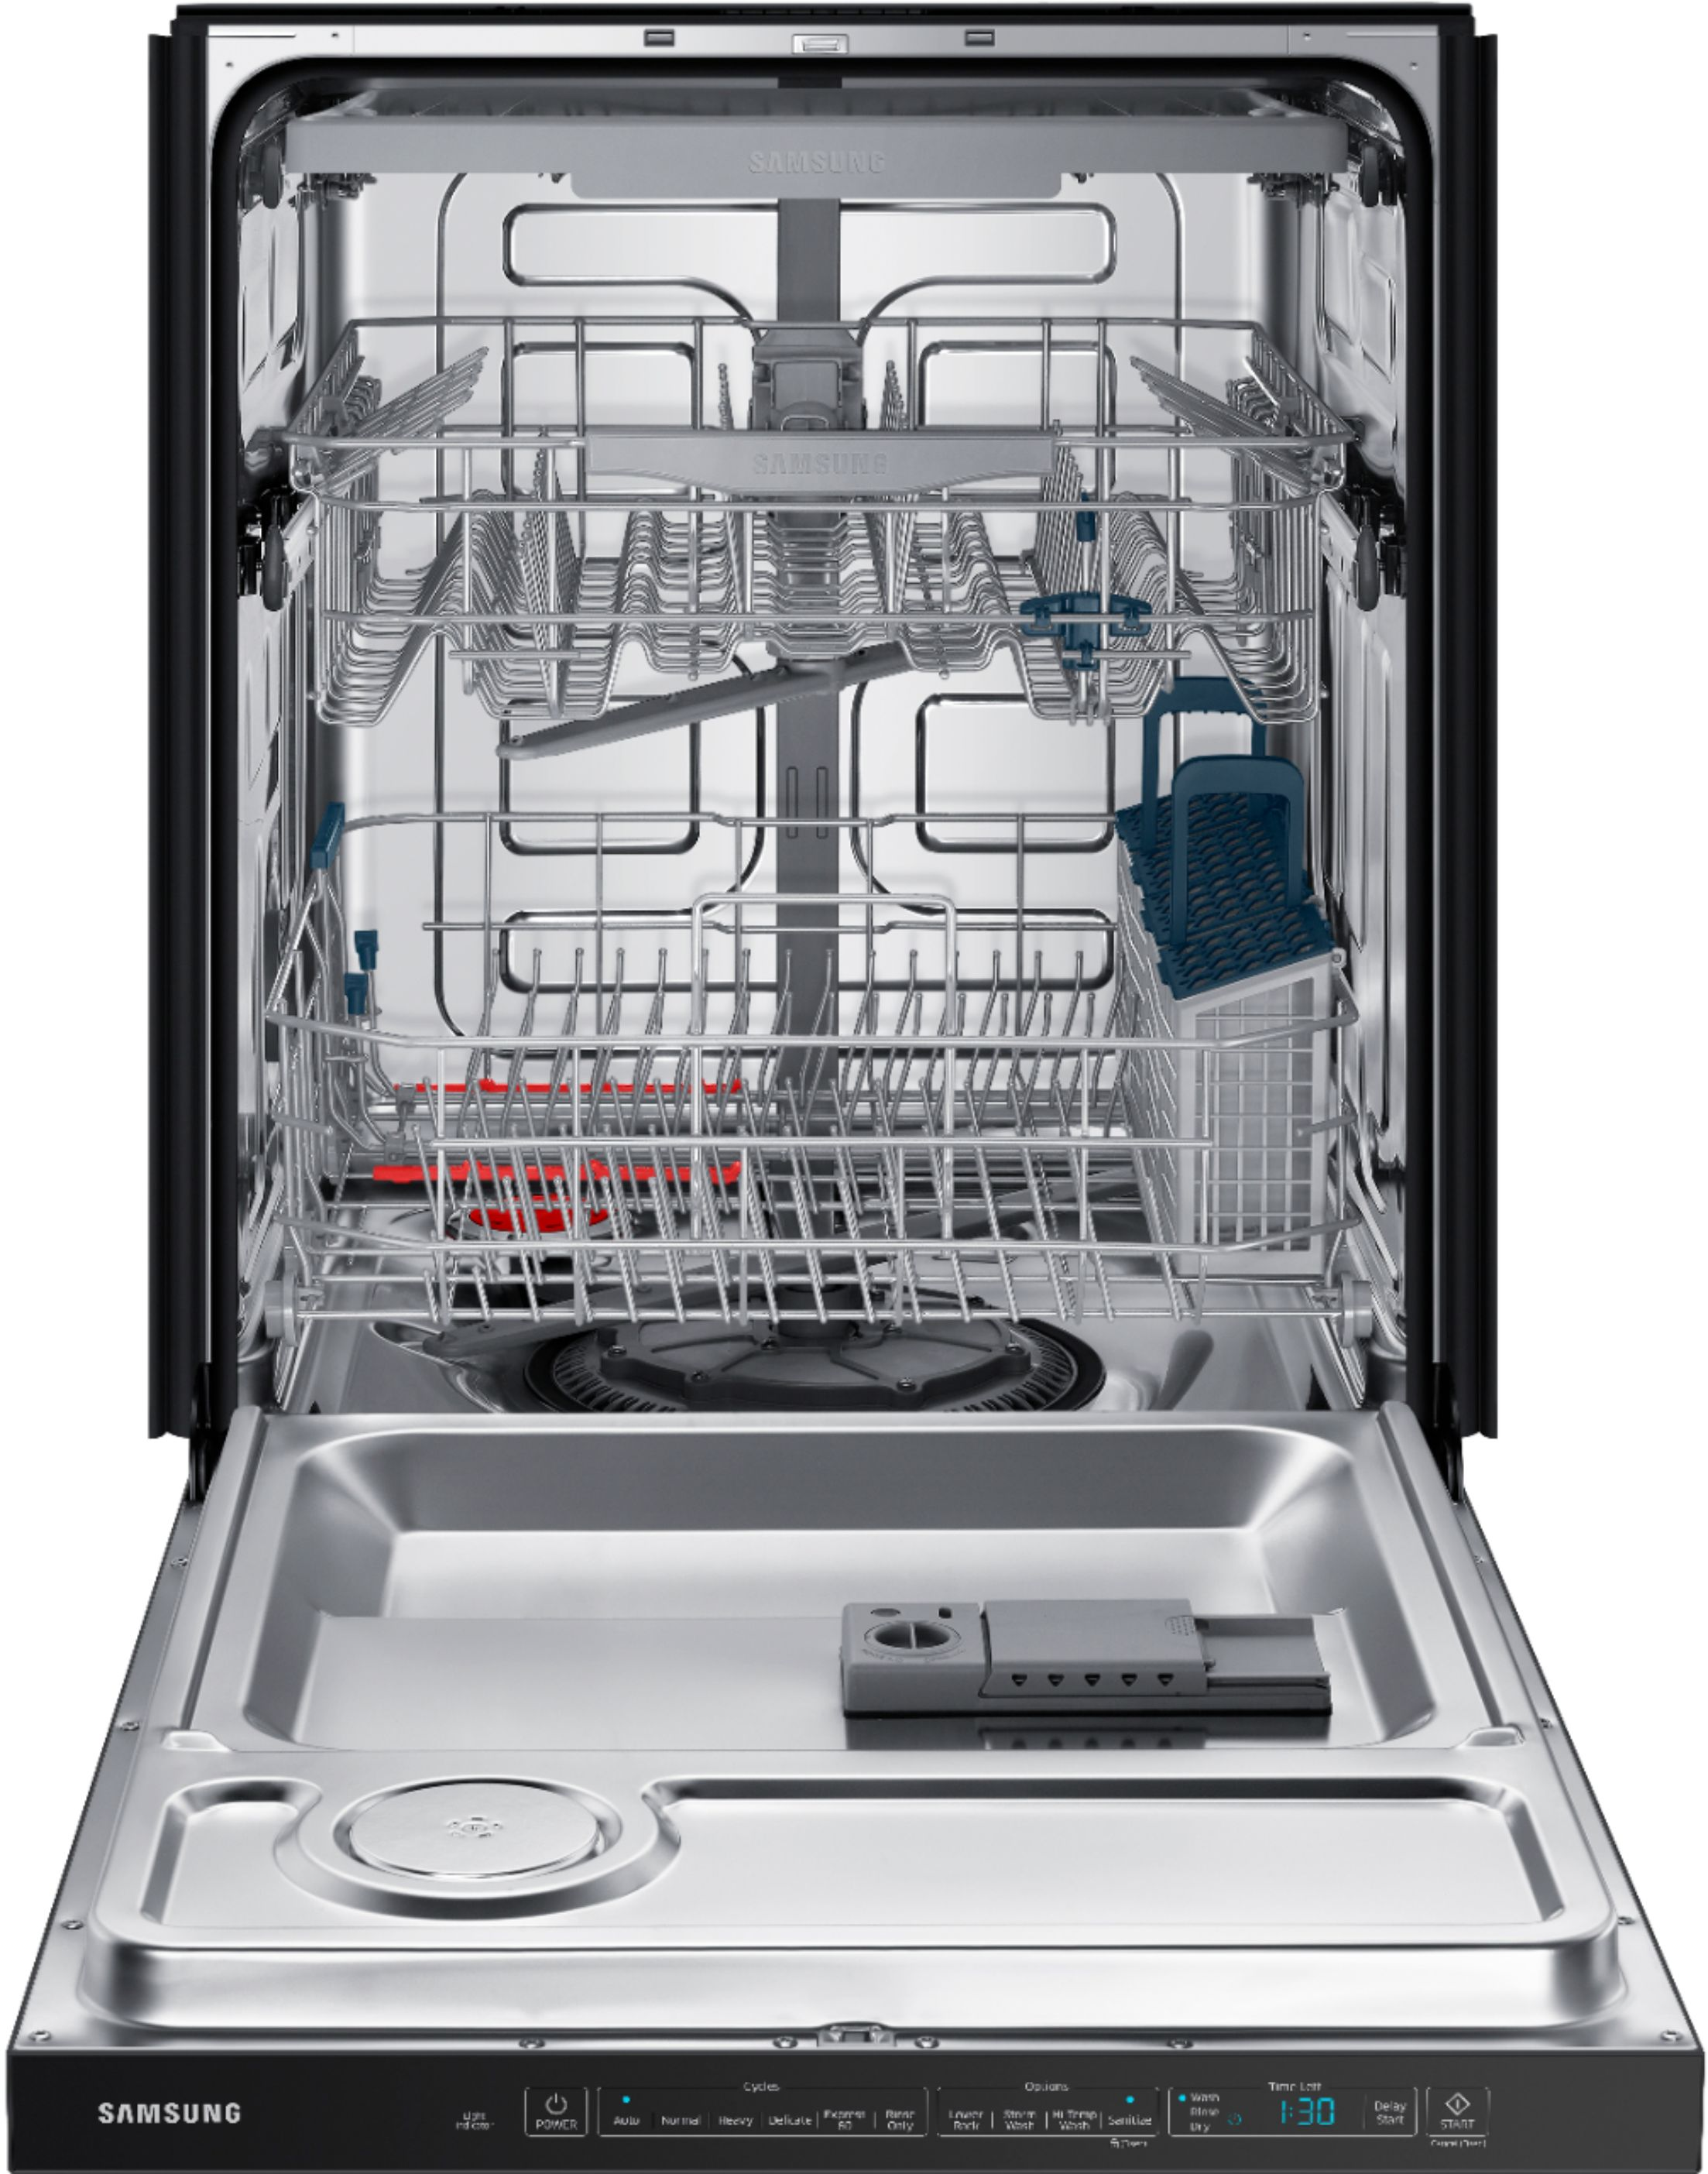 Samsung Dishwasher Kick Plate : samsung, dishwasher, plate, Questions, Answers:, Samsung, StormWash™, Control, Built-In, Dishwasher, AutoRelease, Rack,, Black, Stainless, Steel, DW80R5060UG